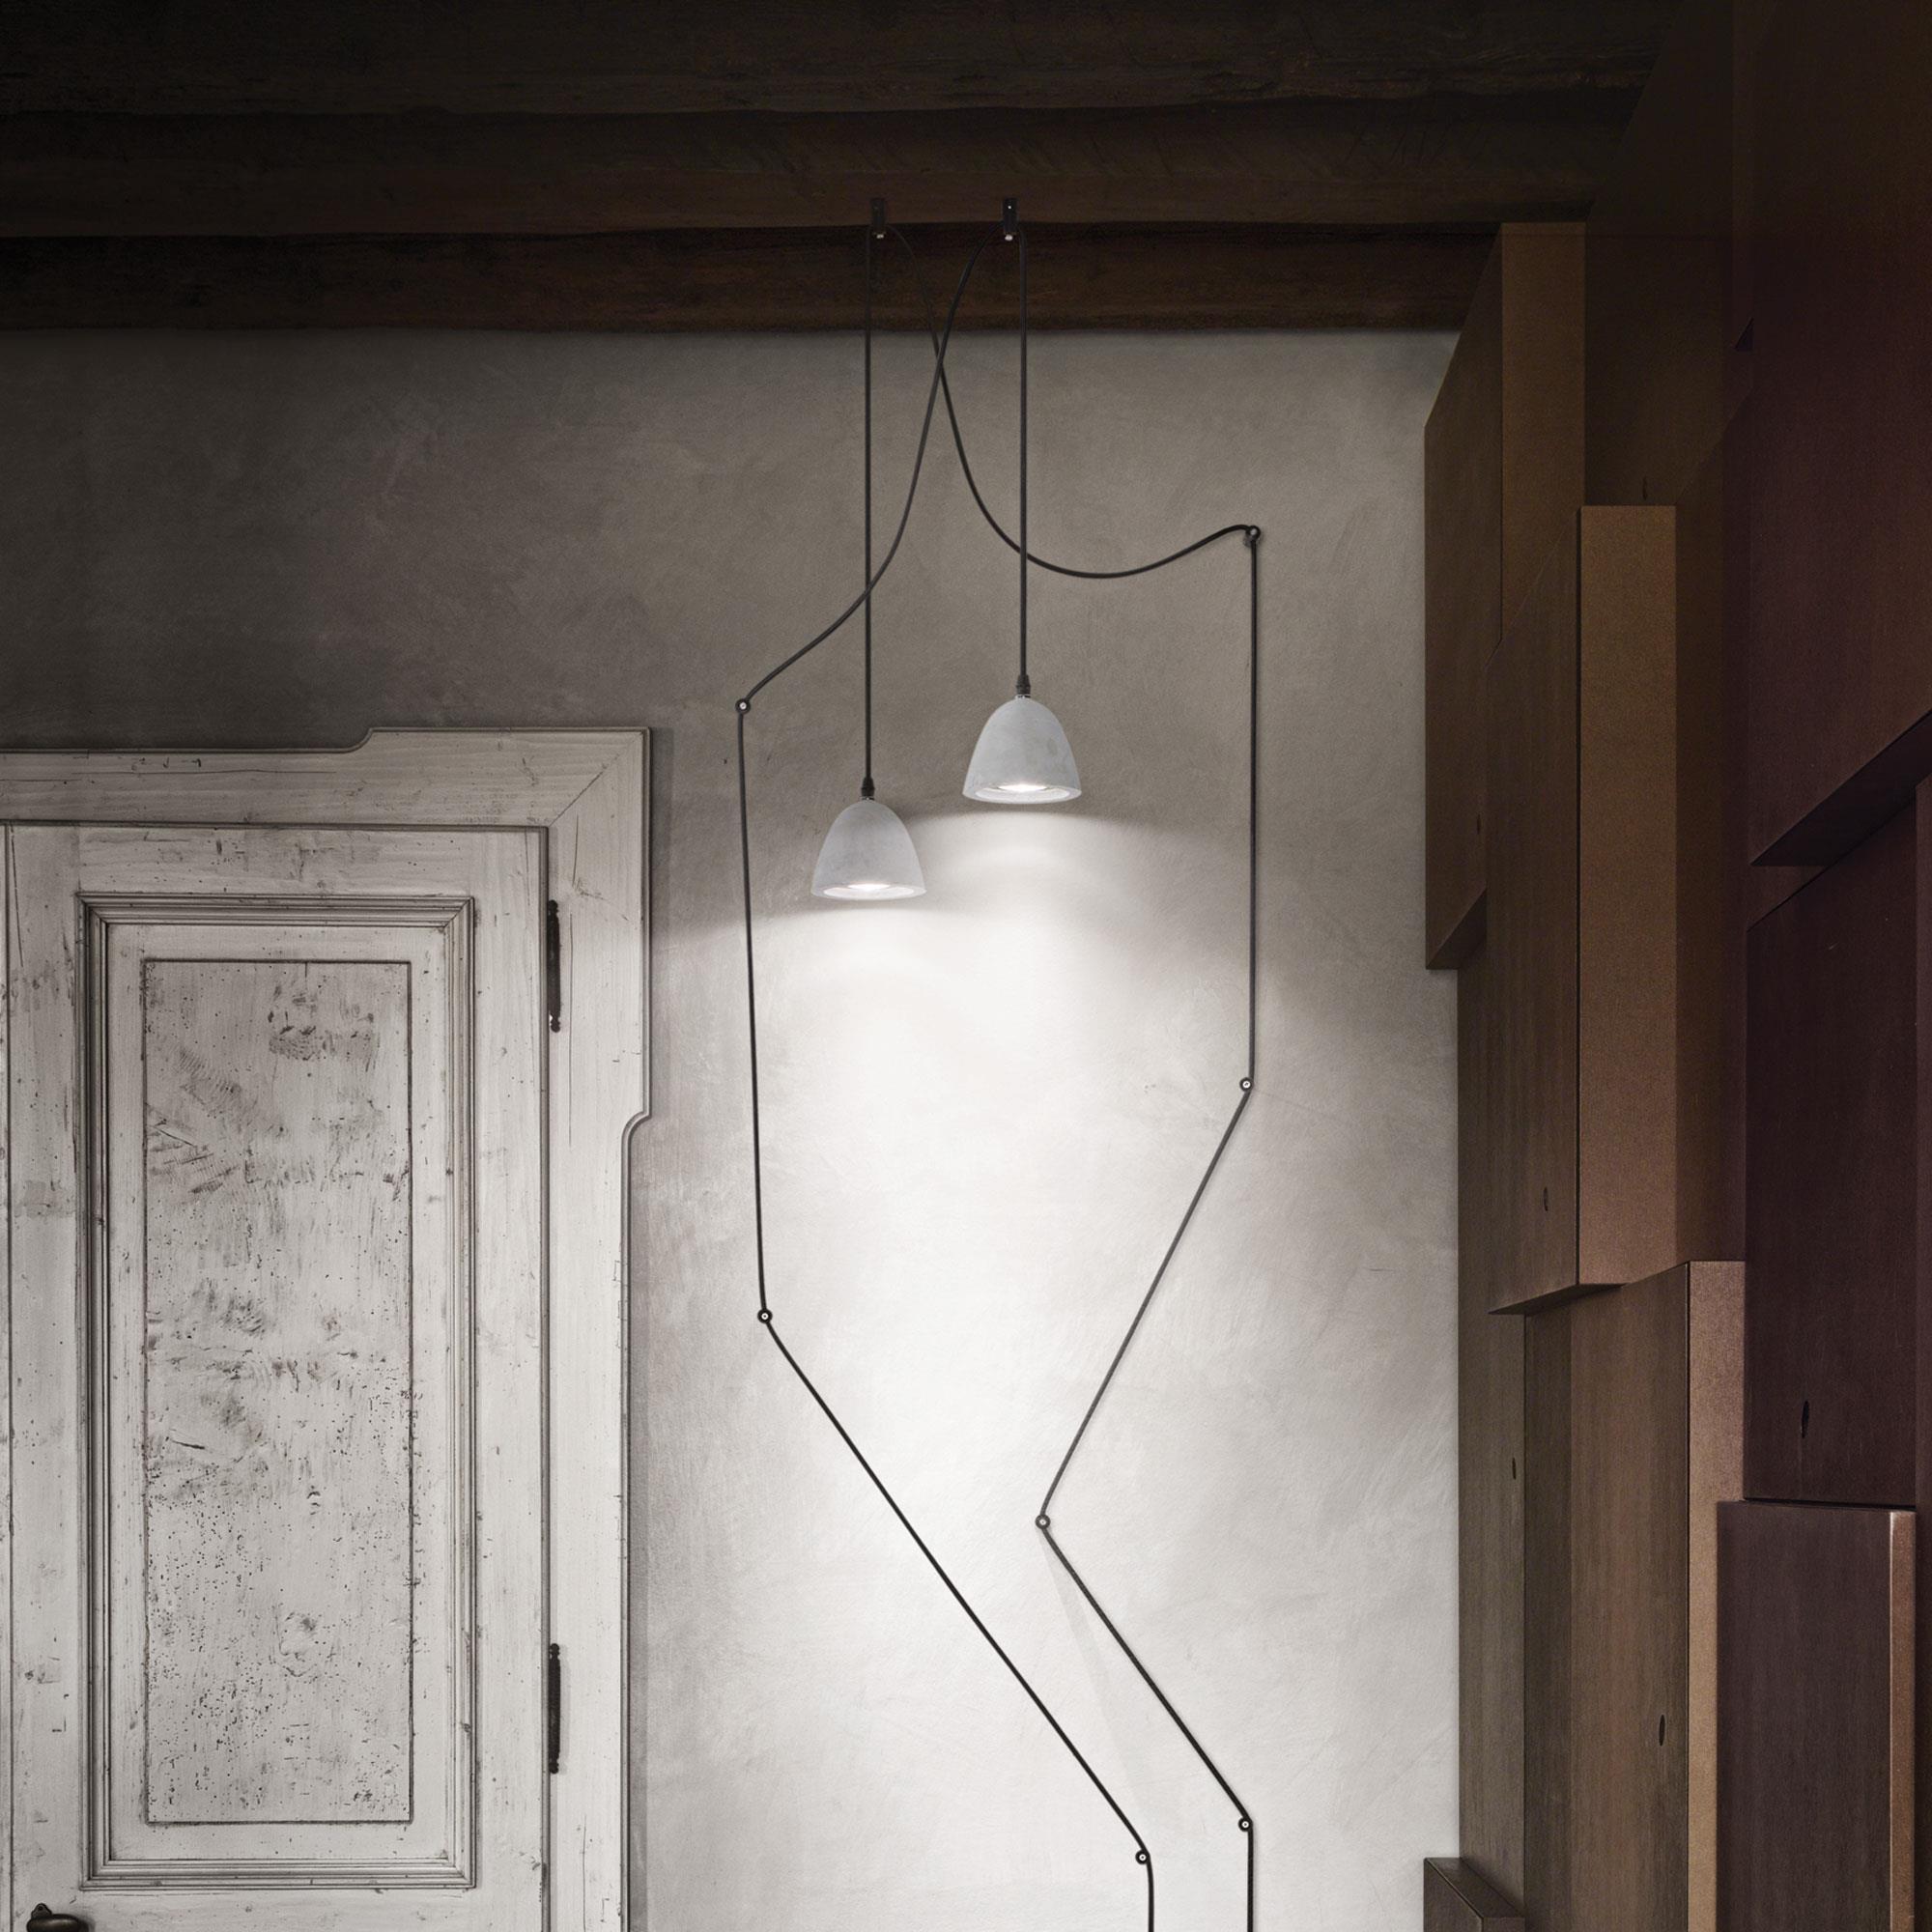 Ideal Lux 110462 Oil-4 SP1 Cemento lámpa függeszték